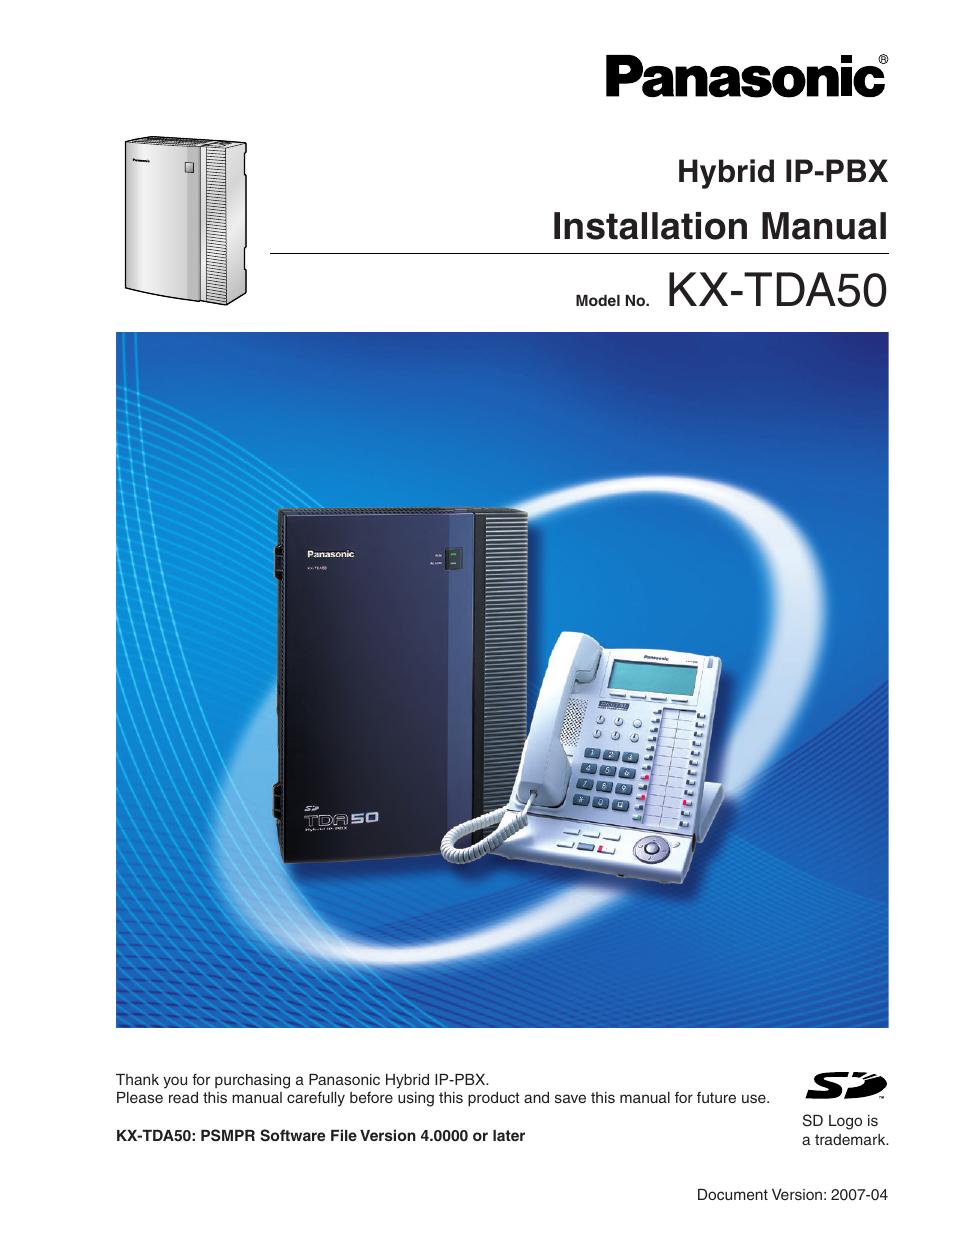 panasonic hybrid ip pbx kx tda50 user manual 158 pages rh manualsdir com panasonic kx-tda50 manual panasonic kx-tda50 programming manual